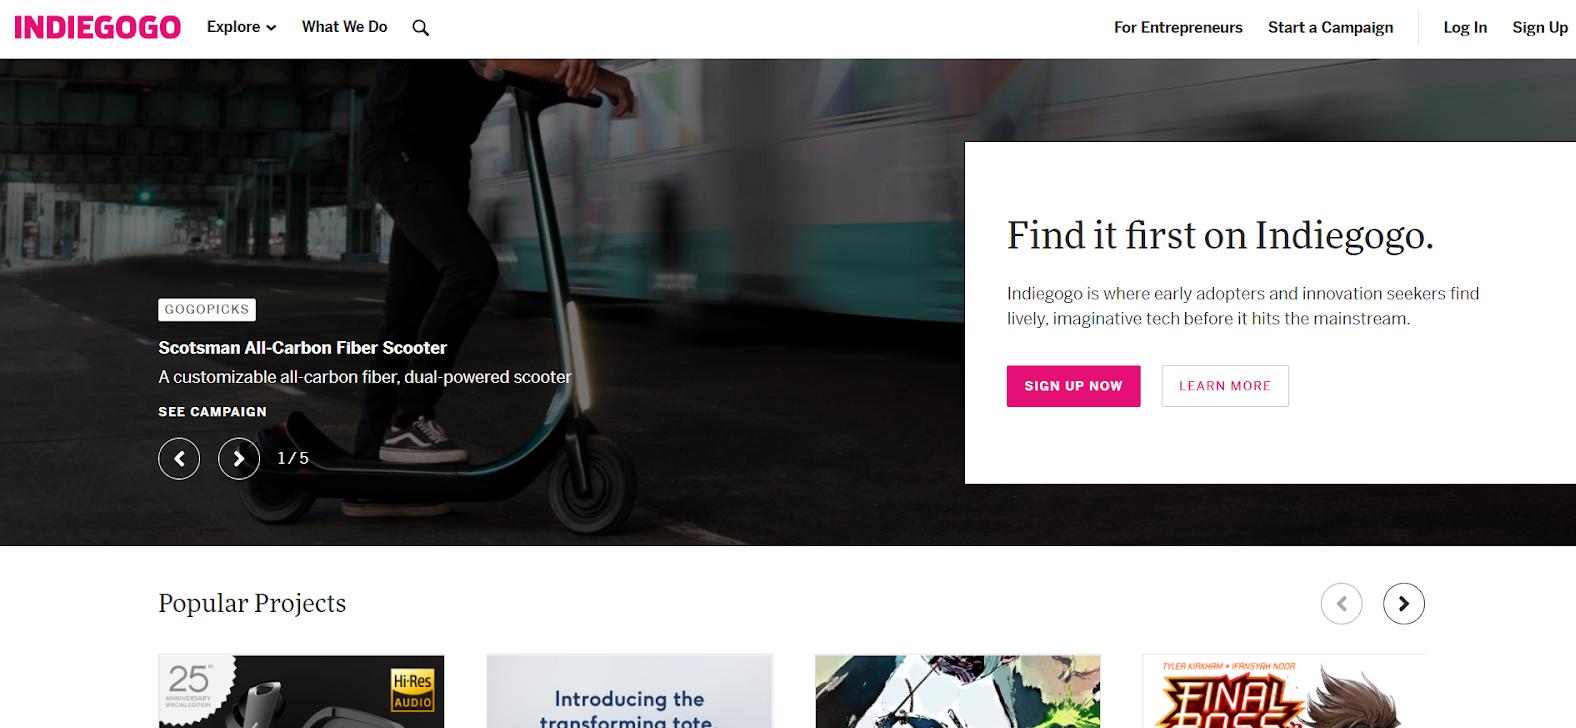 Indiegogo Crowdfunding Page